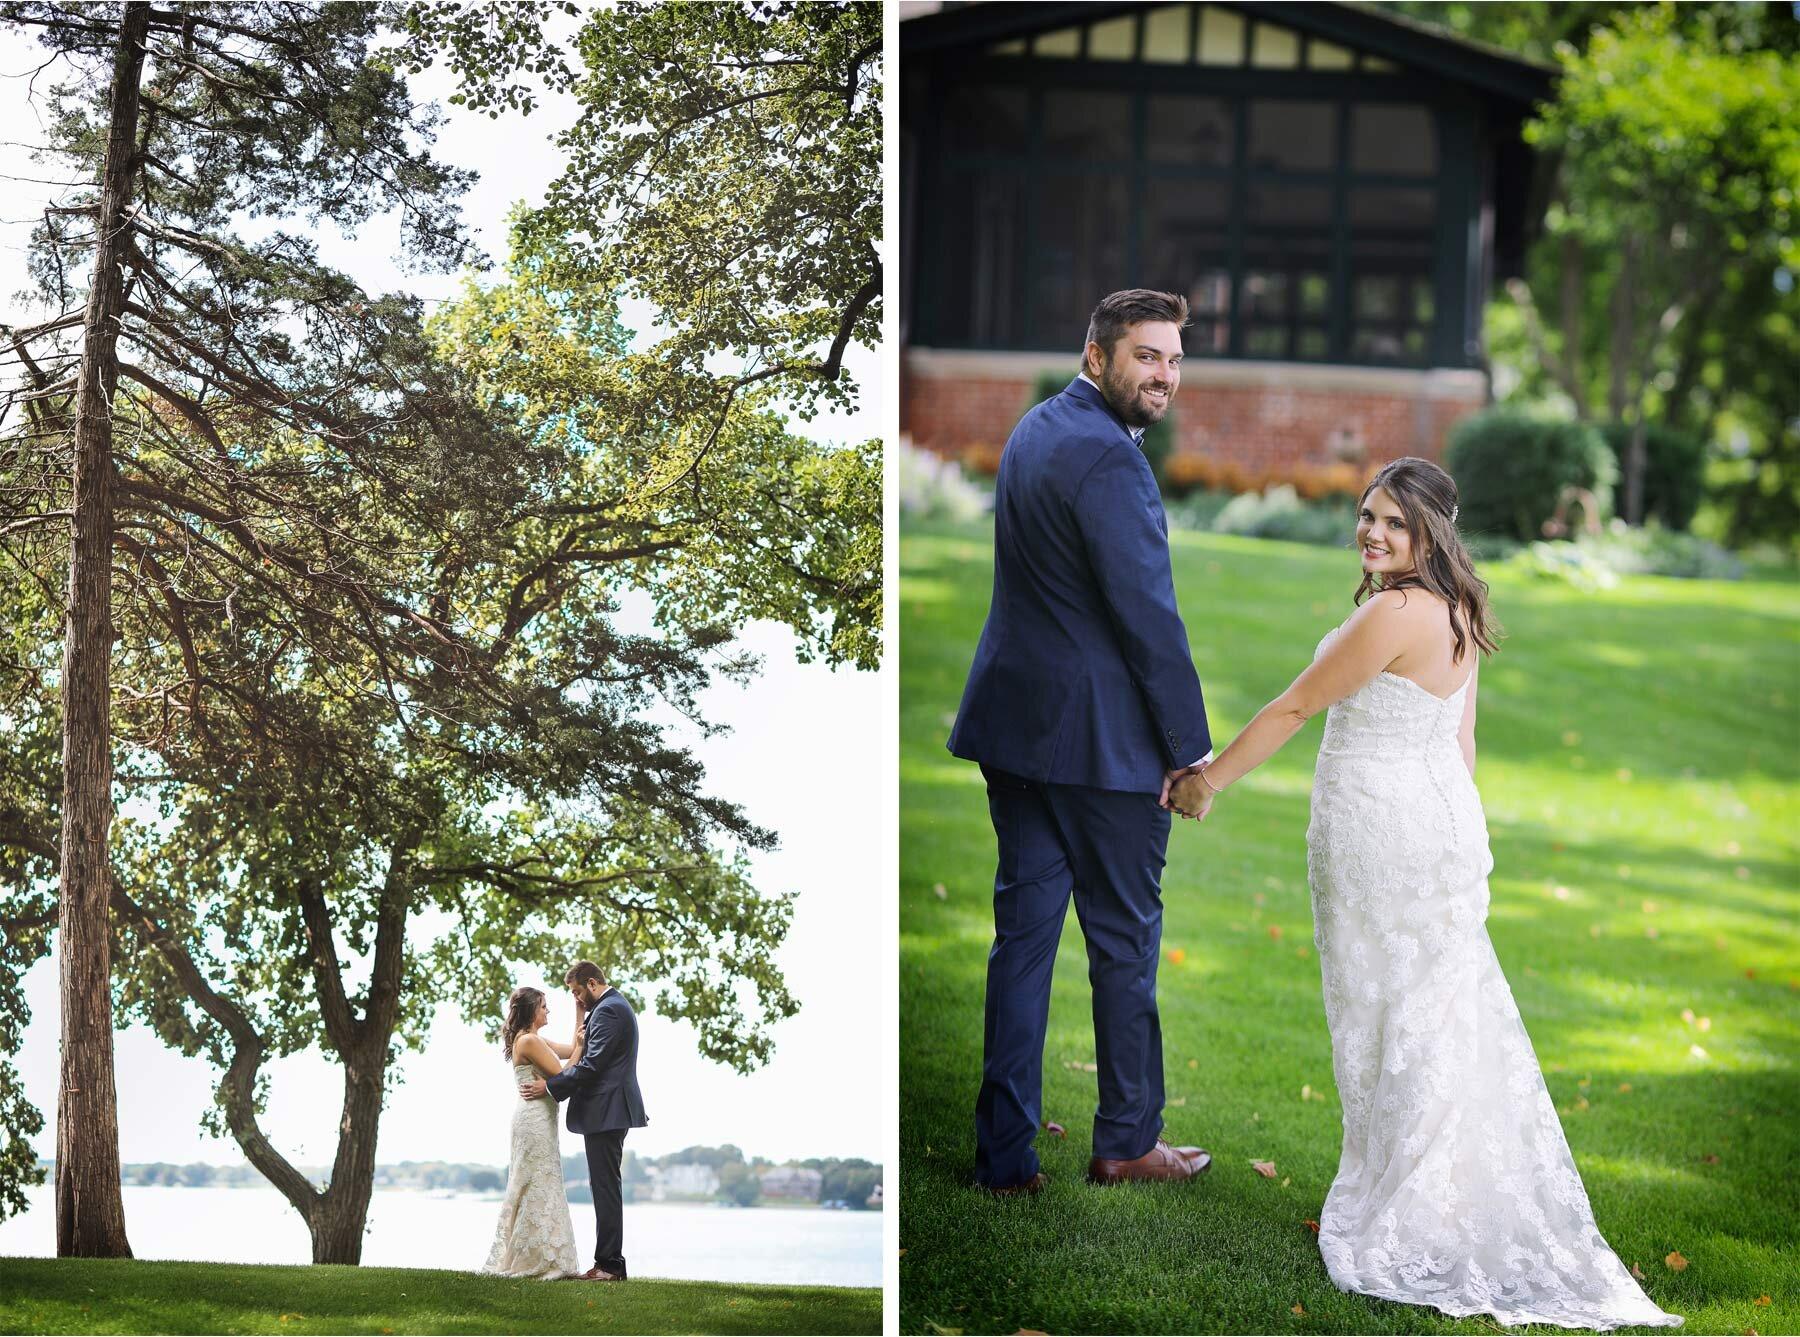 08-Vick-Photography-Wedding-Minnetonka-Minnesota-Family-Home-Bride-Groom-First-Look-Lake-Katie-and-David.jpg